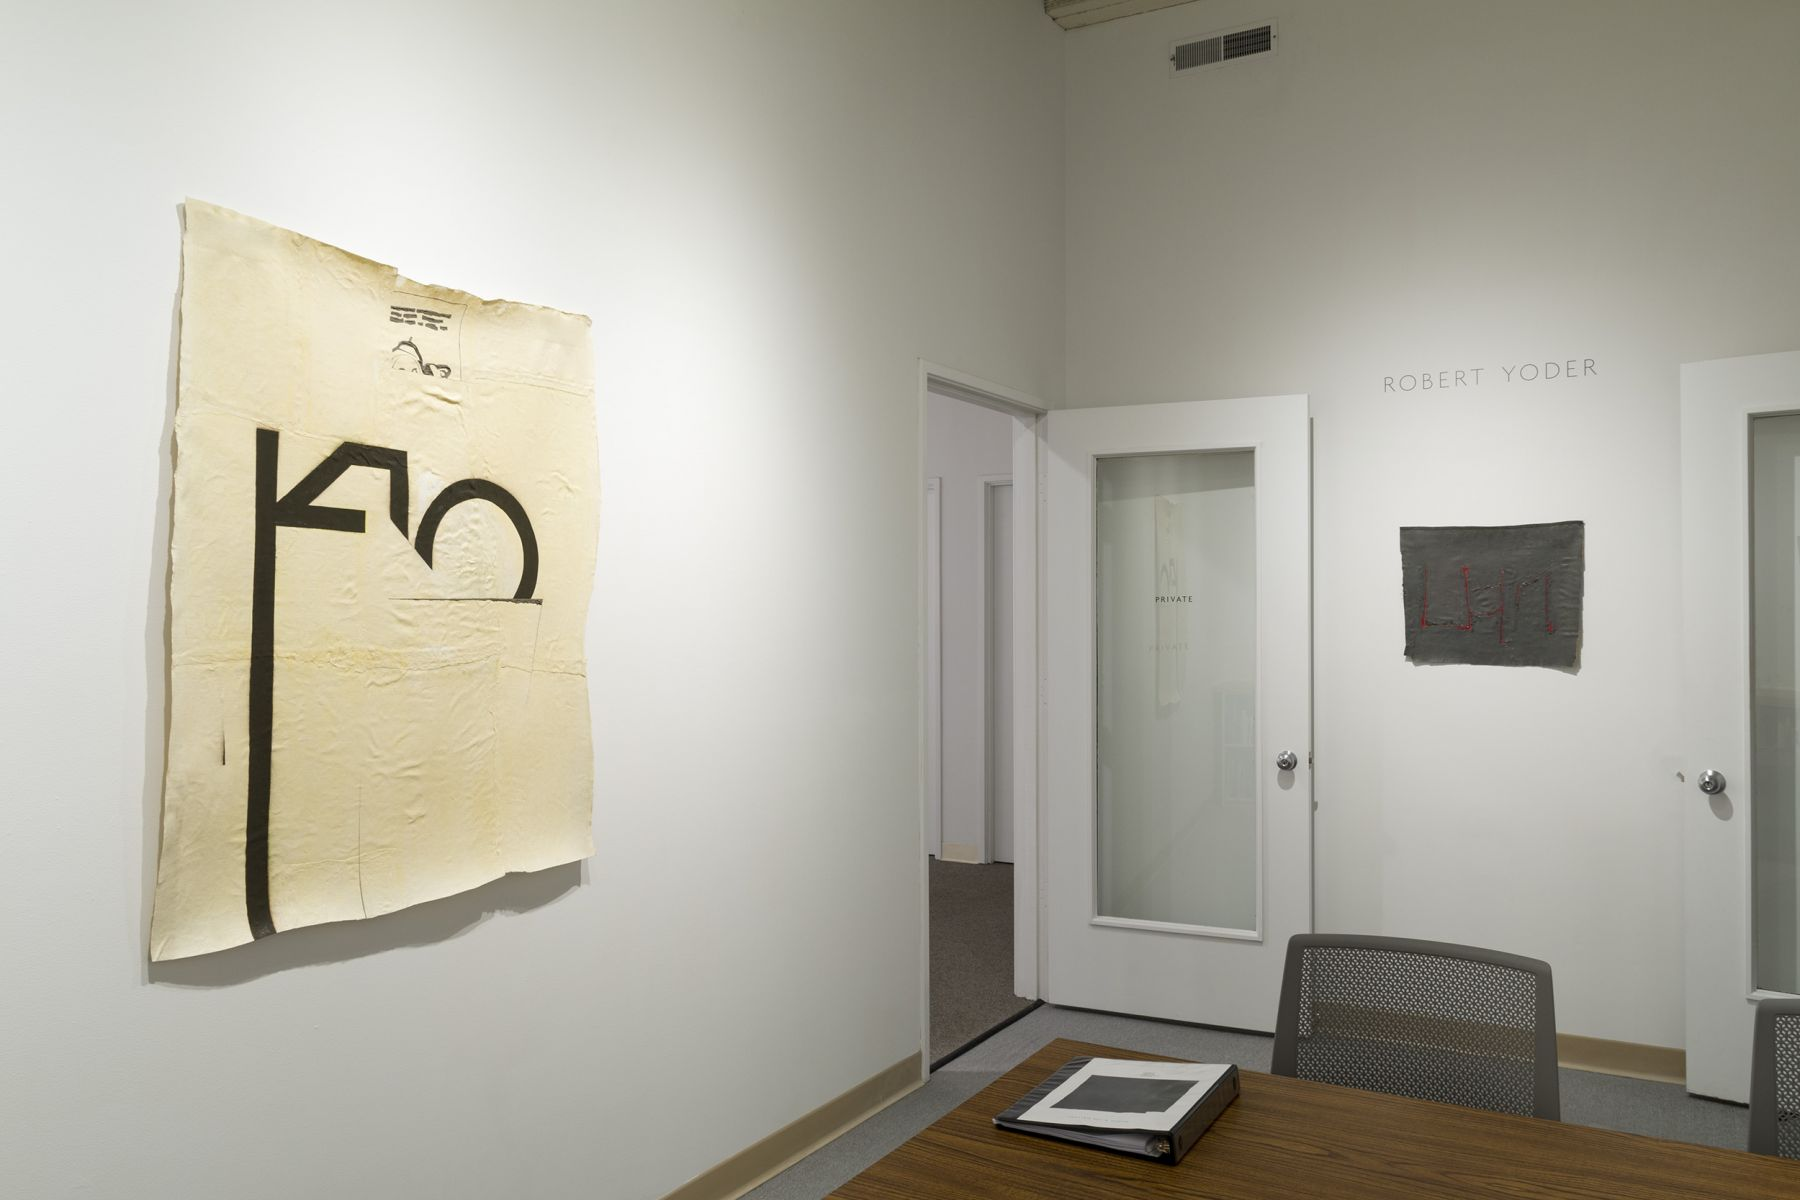 Robert Yoder | Club Number | Installation View 7